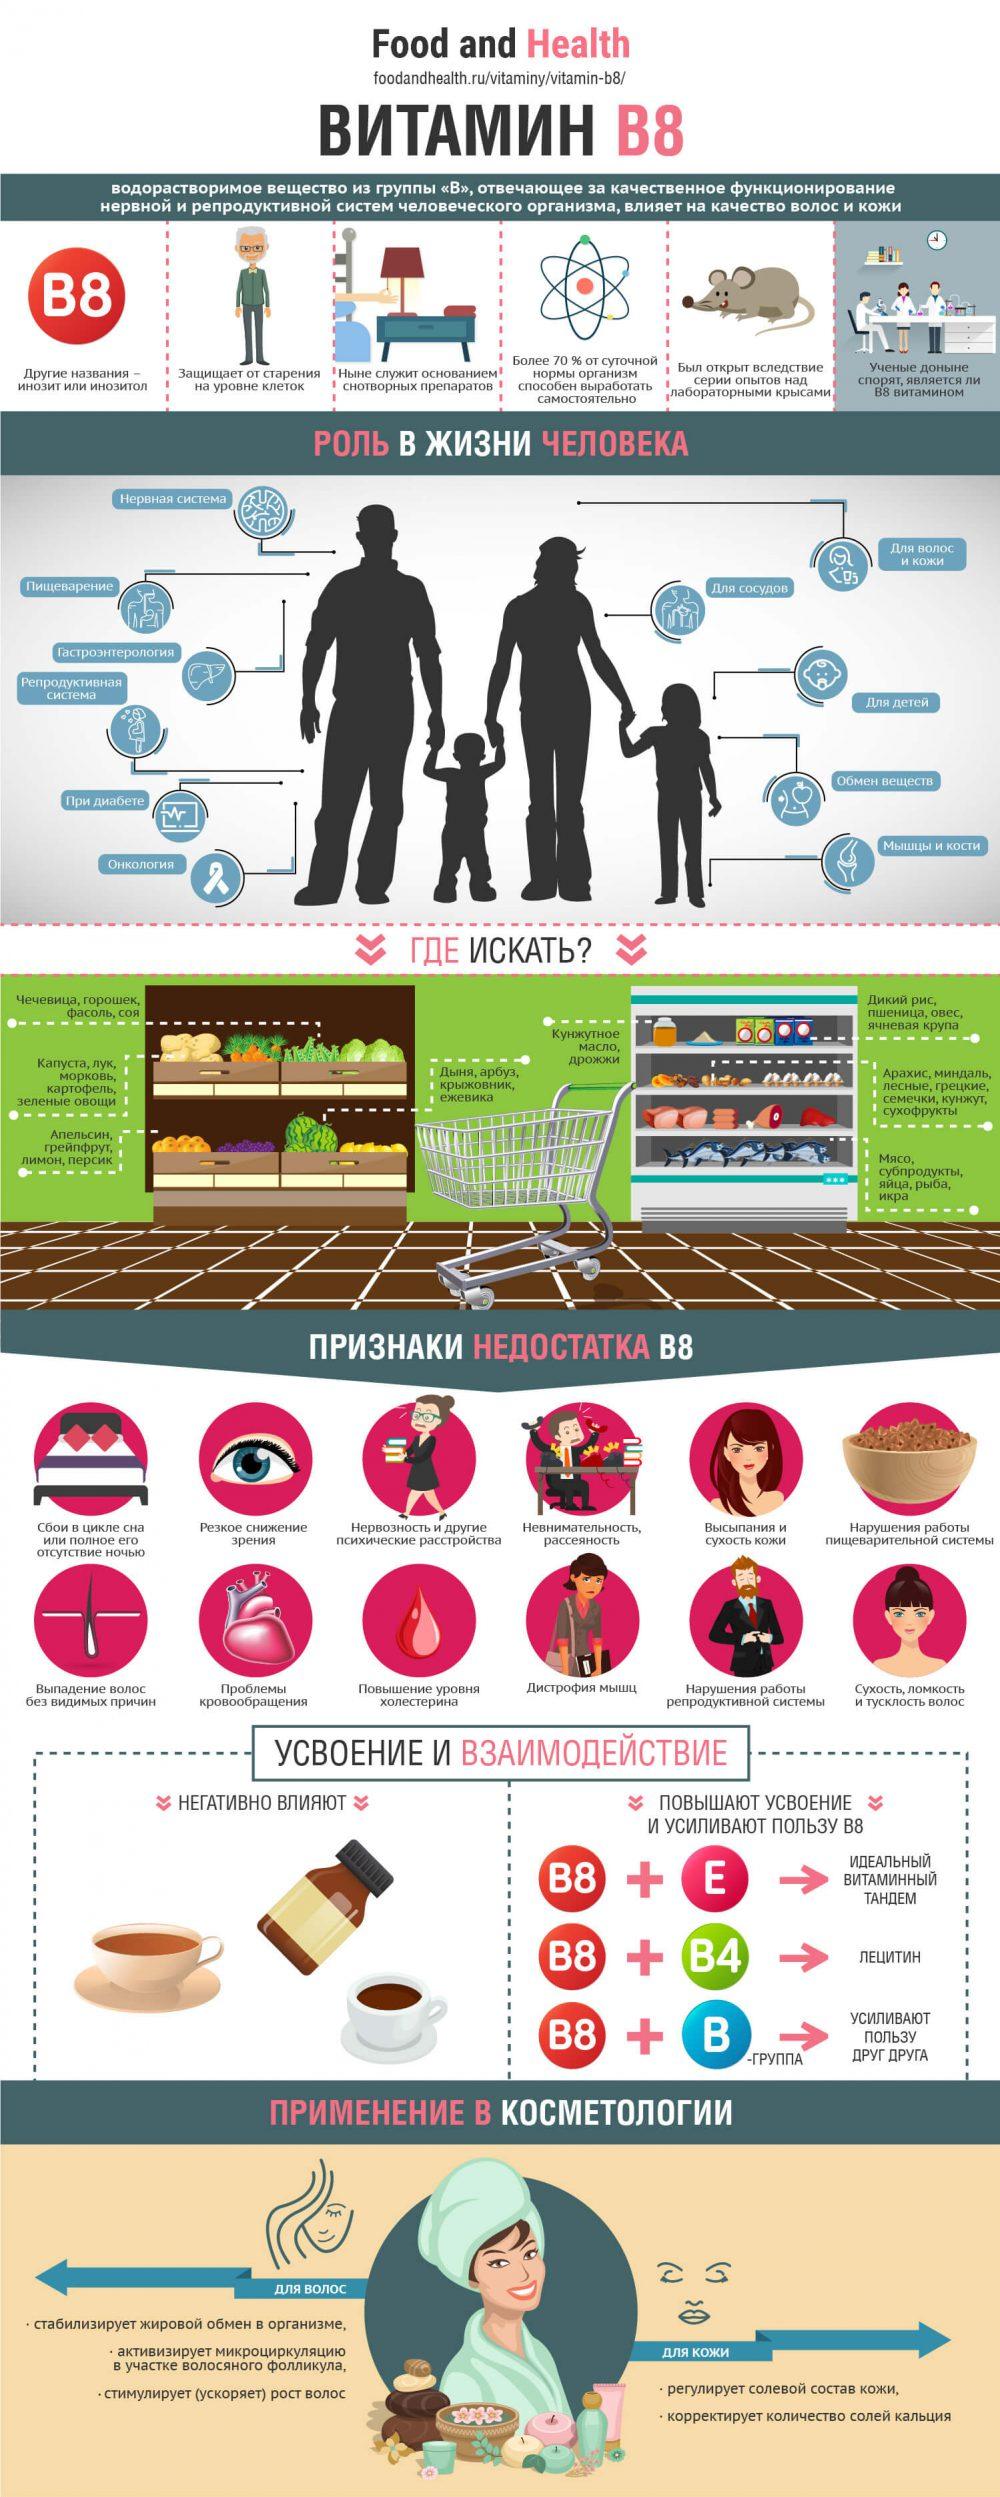 Витамин B8 - инфографика